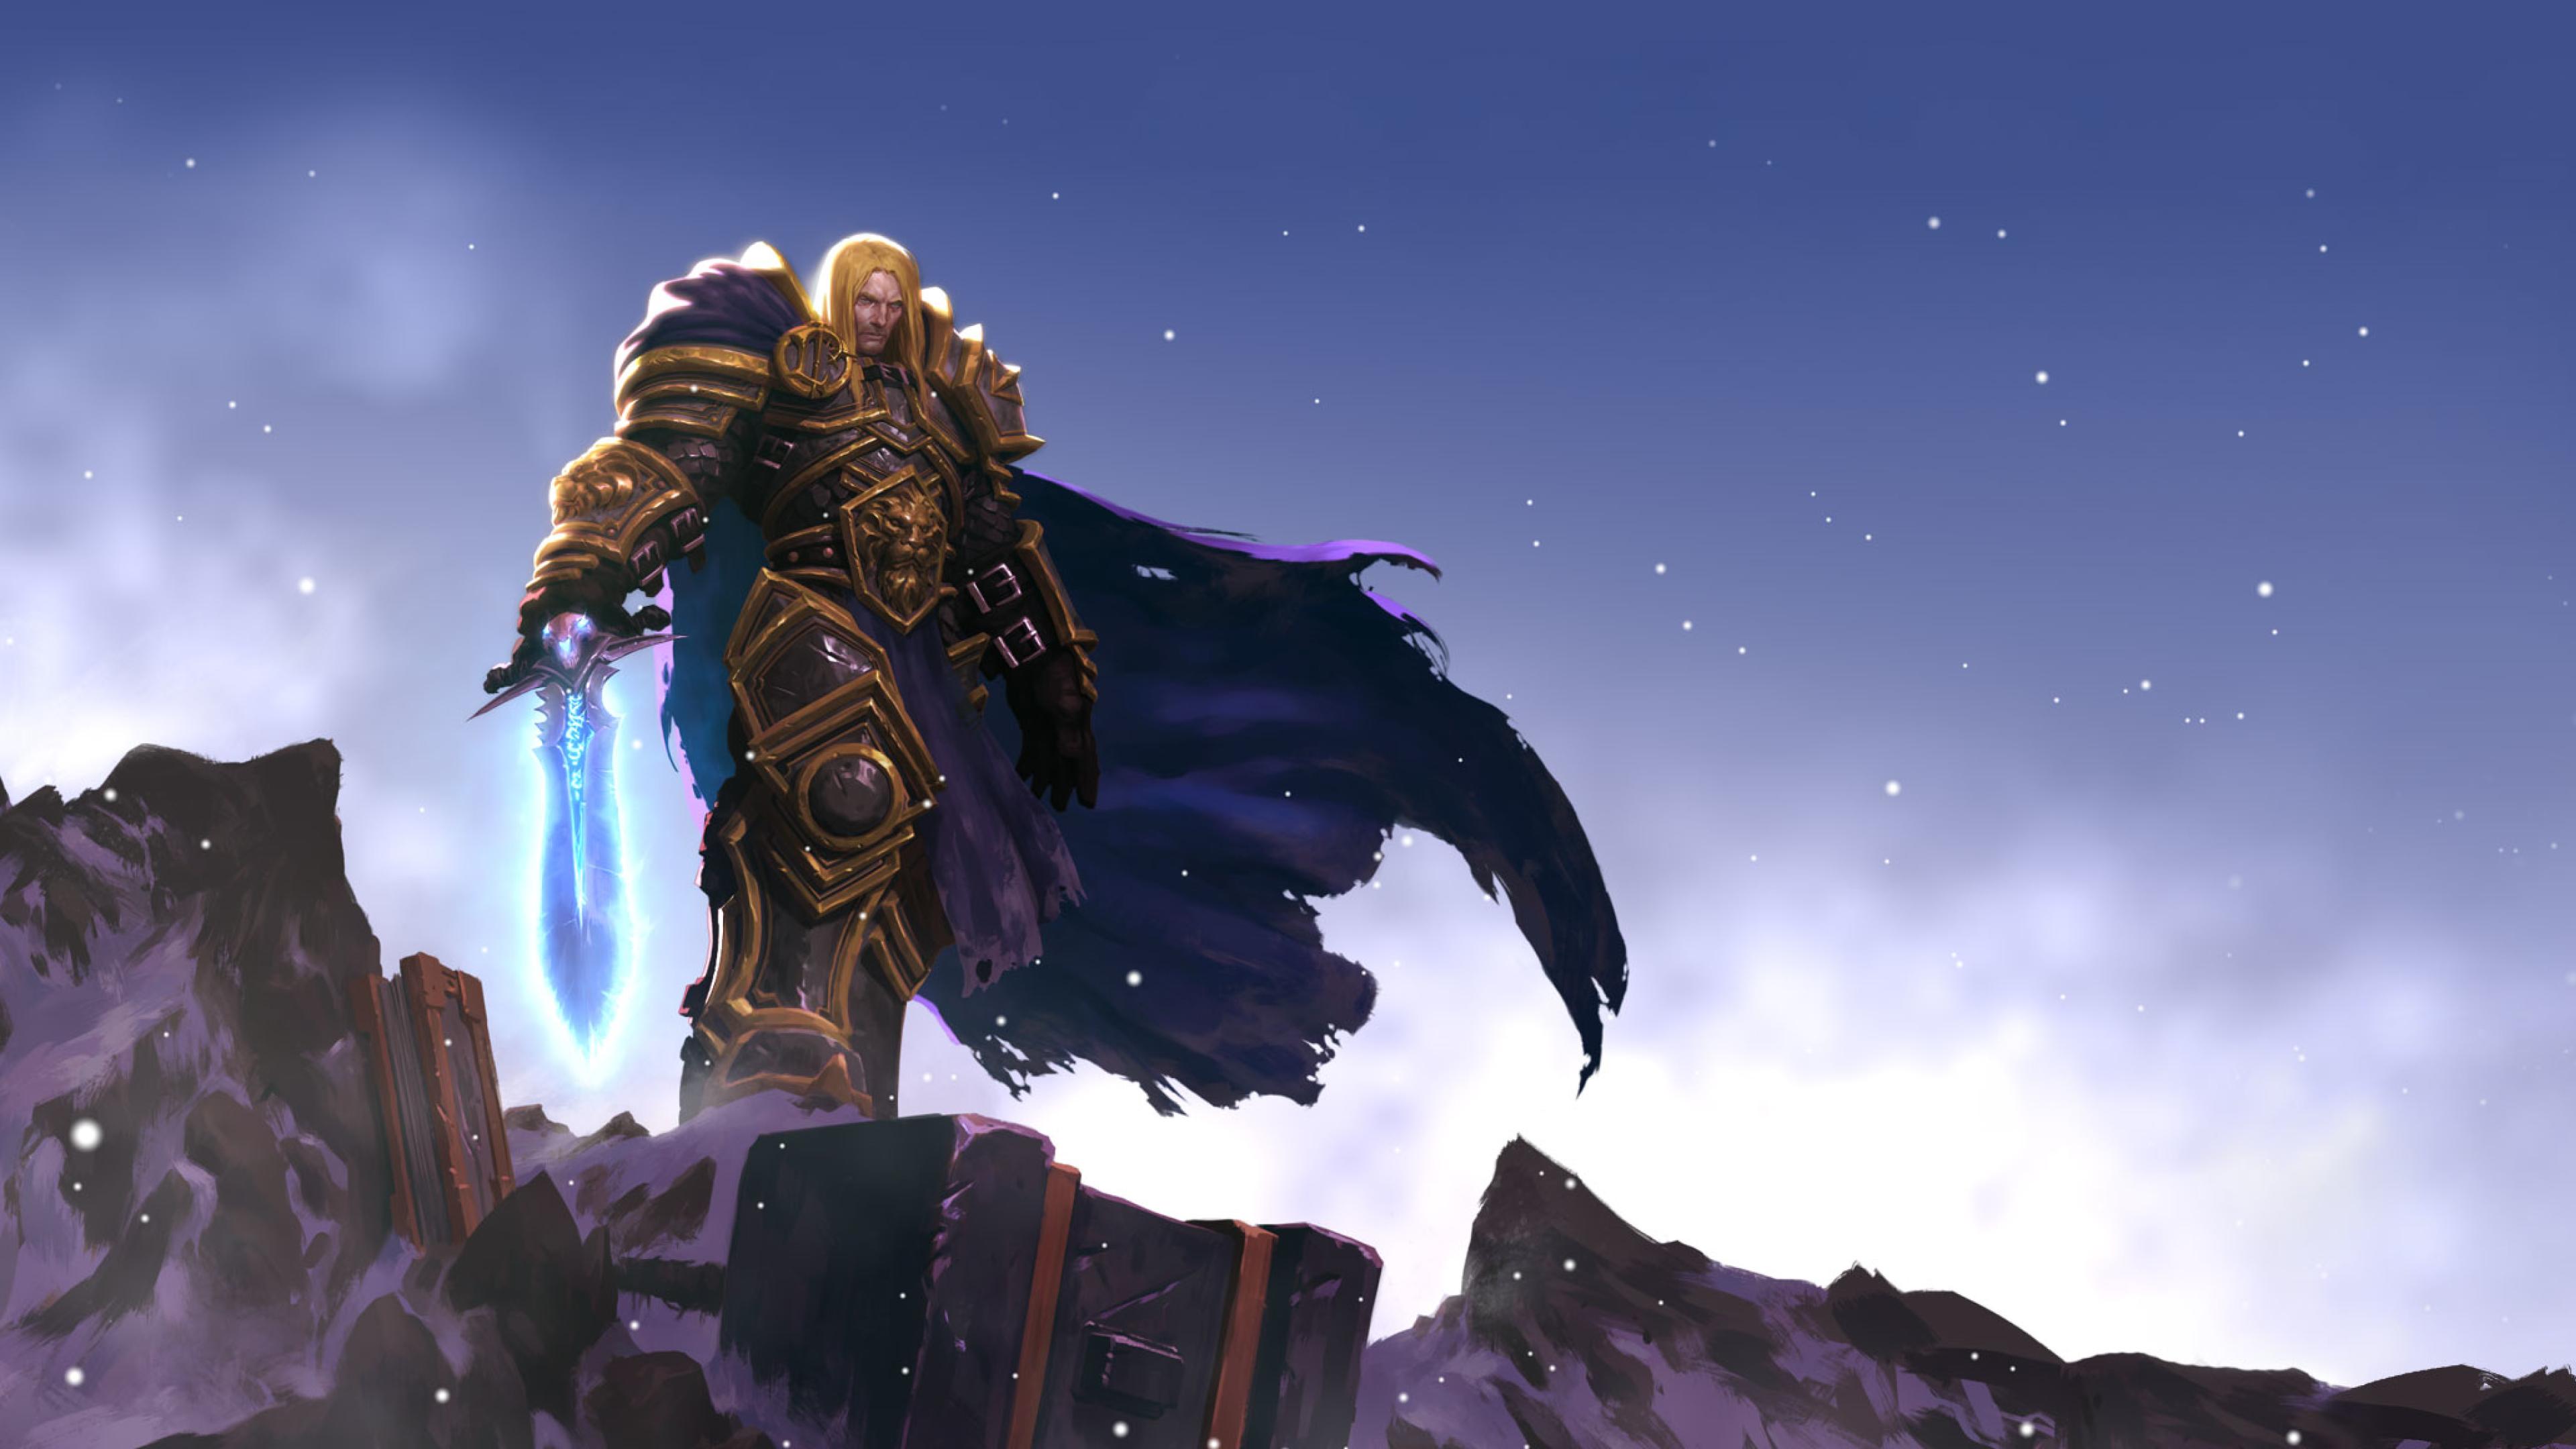 3840x2160 Arthas Menethil World Of Warcraft Game 4k